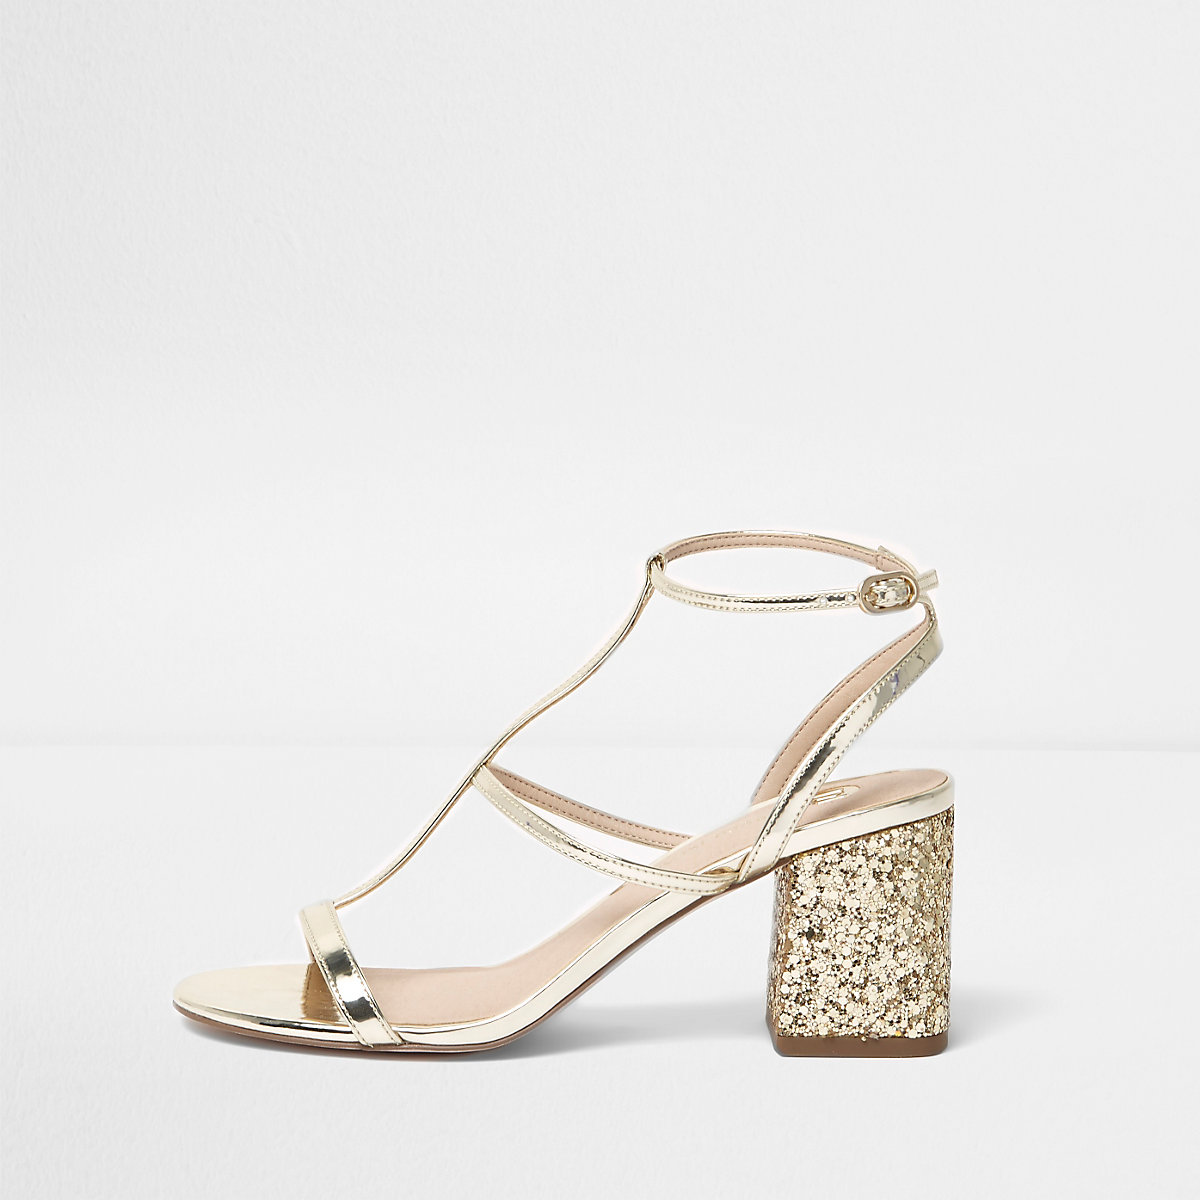 Gold Caged Glitter Block Heel Sandals Sandals Shoes